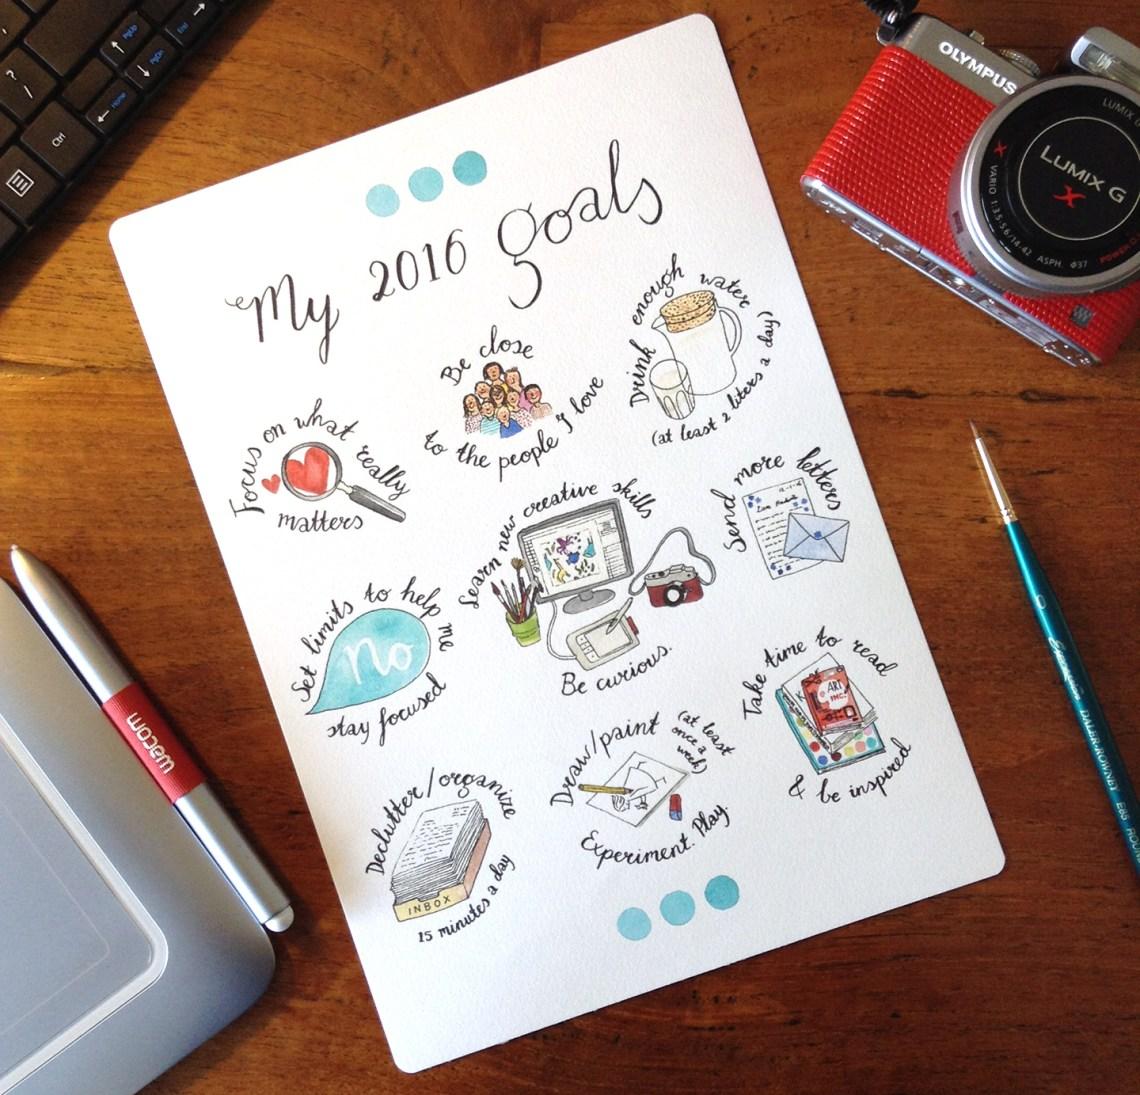 January 2016 Creative Challenge Winner + Entries   The Postman's Knock